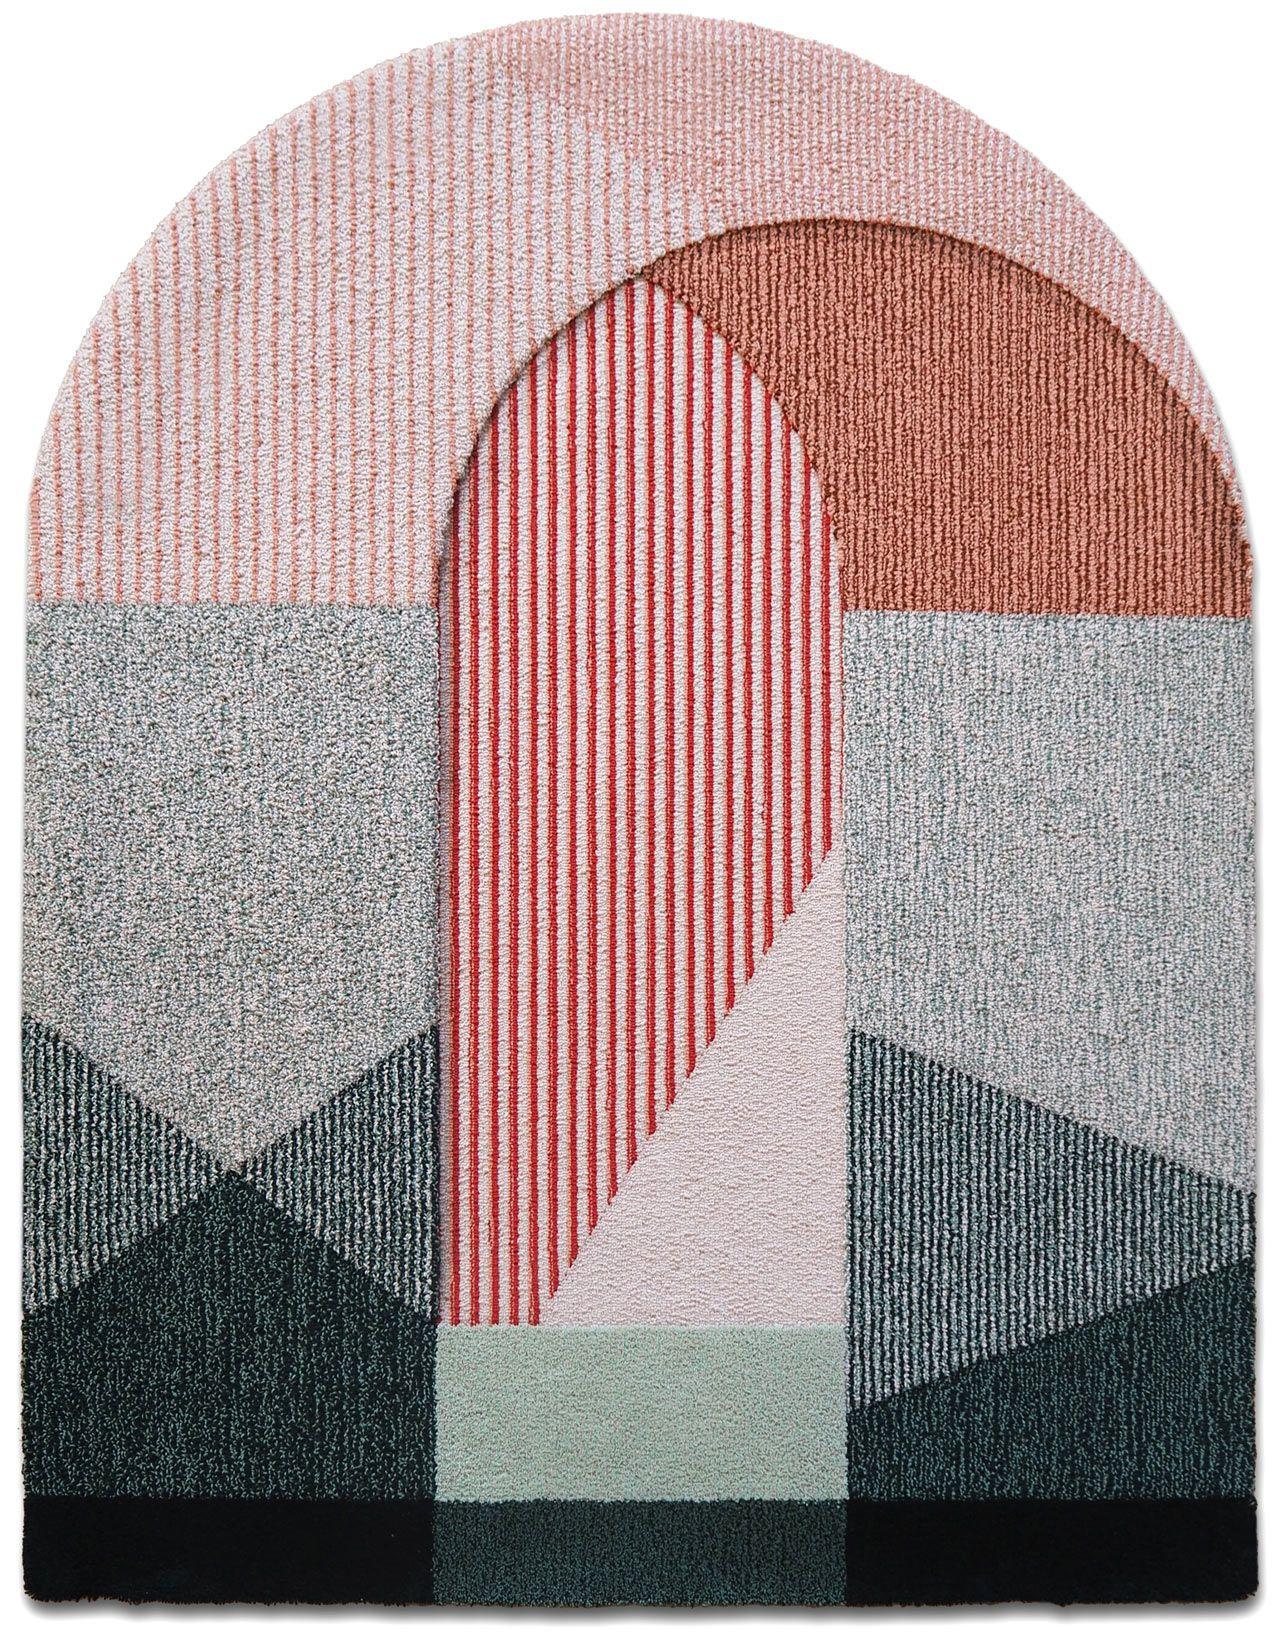 Portego 2017 14 Sottoportico Design Milk Geometric Rug Rugs On Carpet Carpet Trends